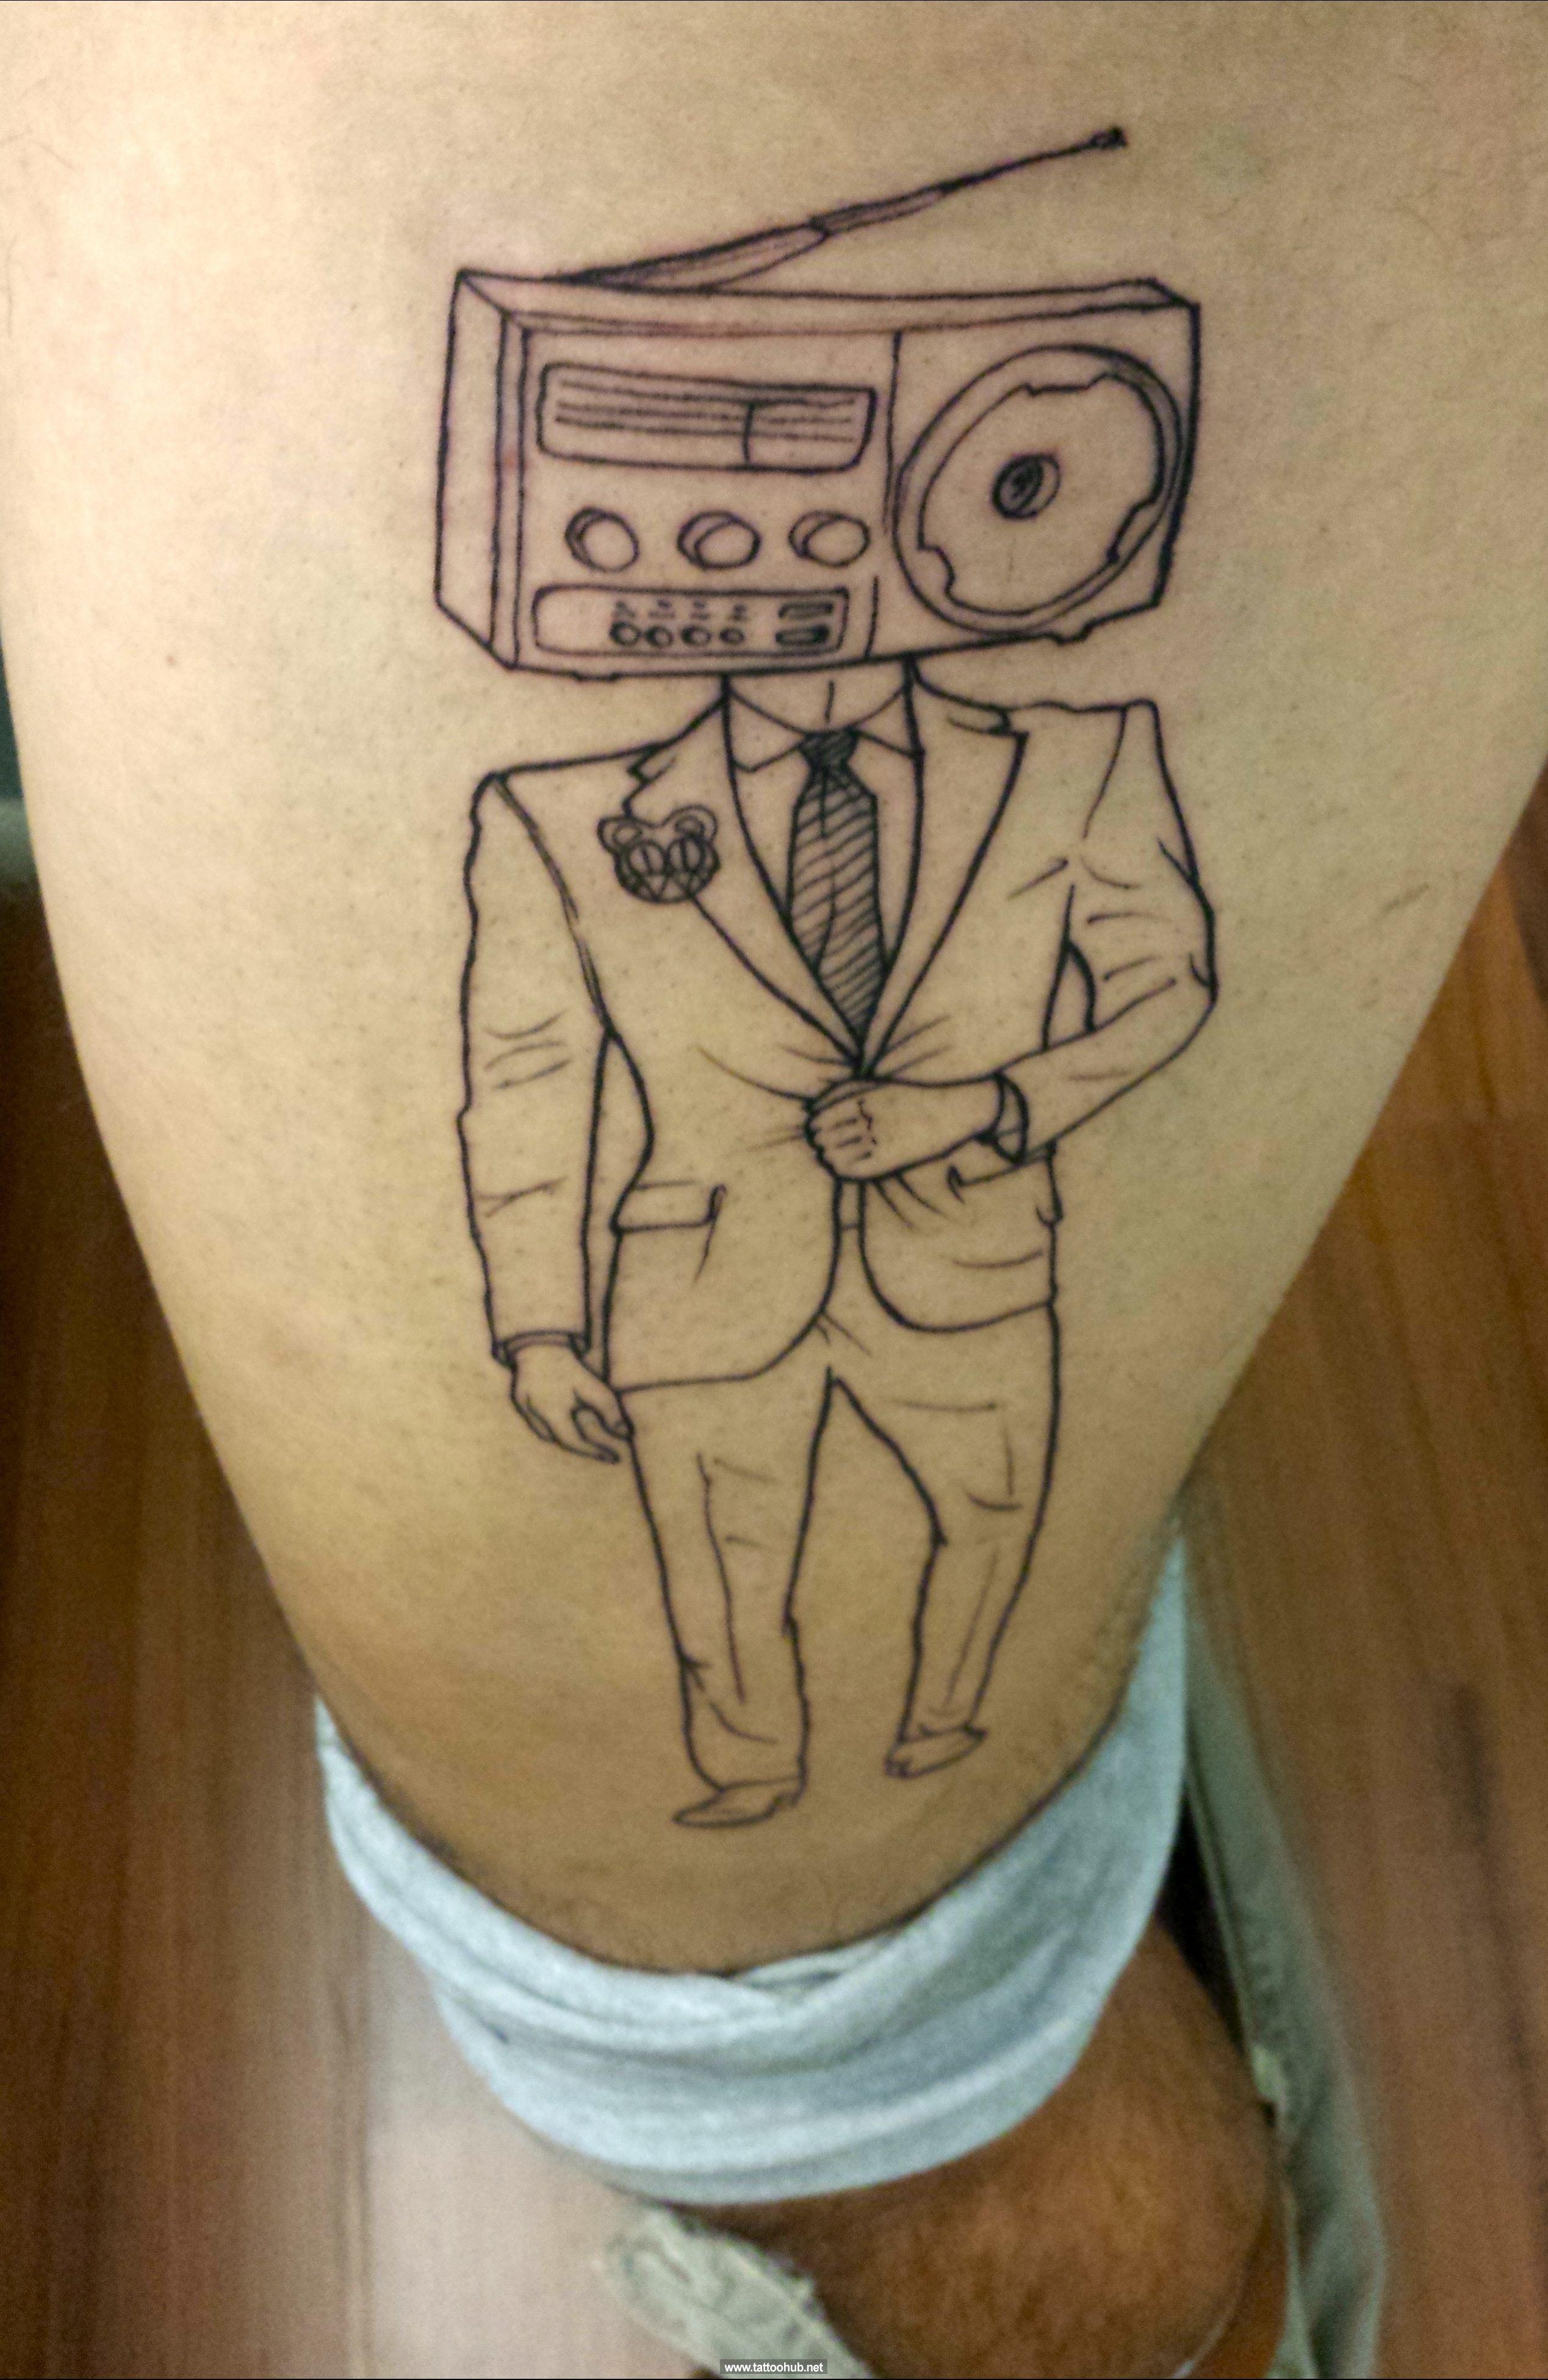 radiohead tattoo art tattoos pinterest radiohead tattoo tattoo art and tattoo. Black Bedroom Furniture Sets. Home Design Ideas